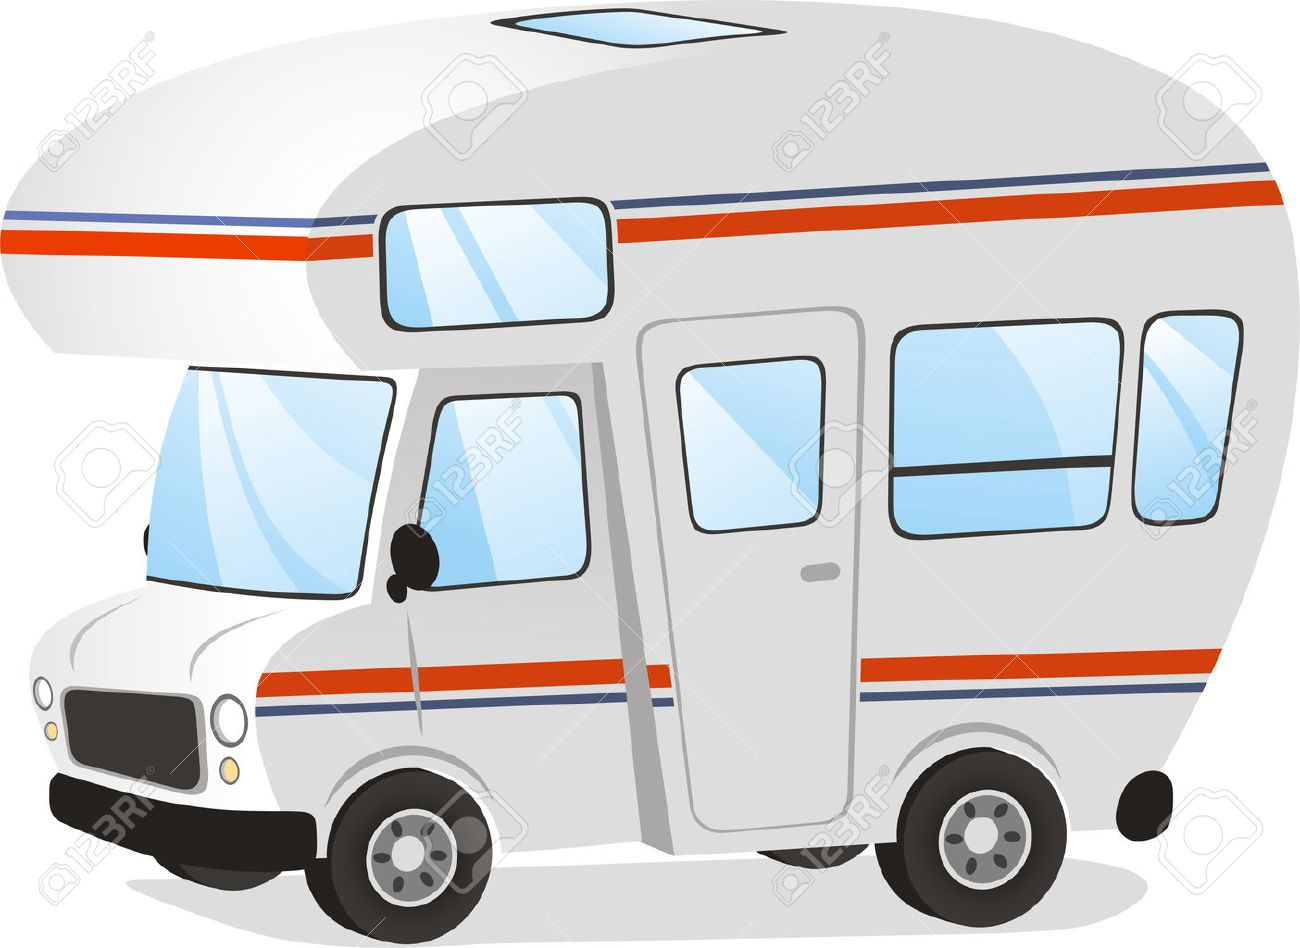 Mobile Home Motorhome Caravan Trailer Vehicle Vector Illustration Cartoon Stock